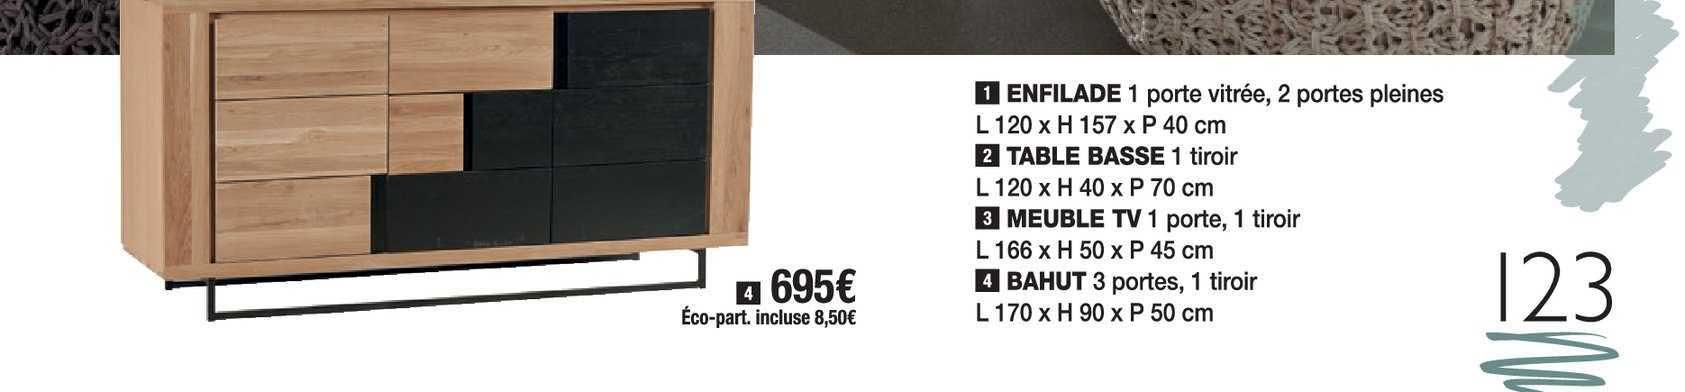 offre enfilade table basse meuble tv